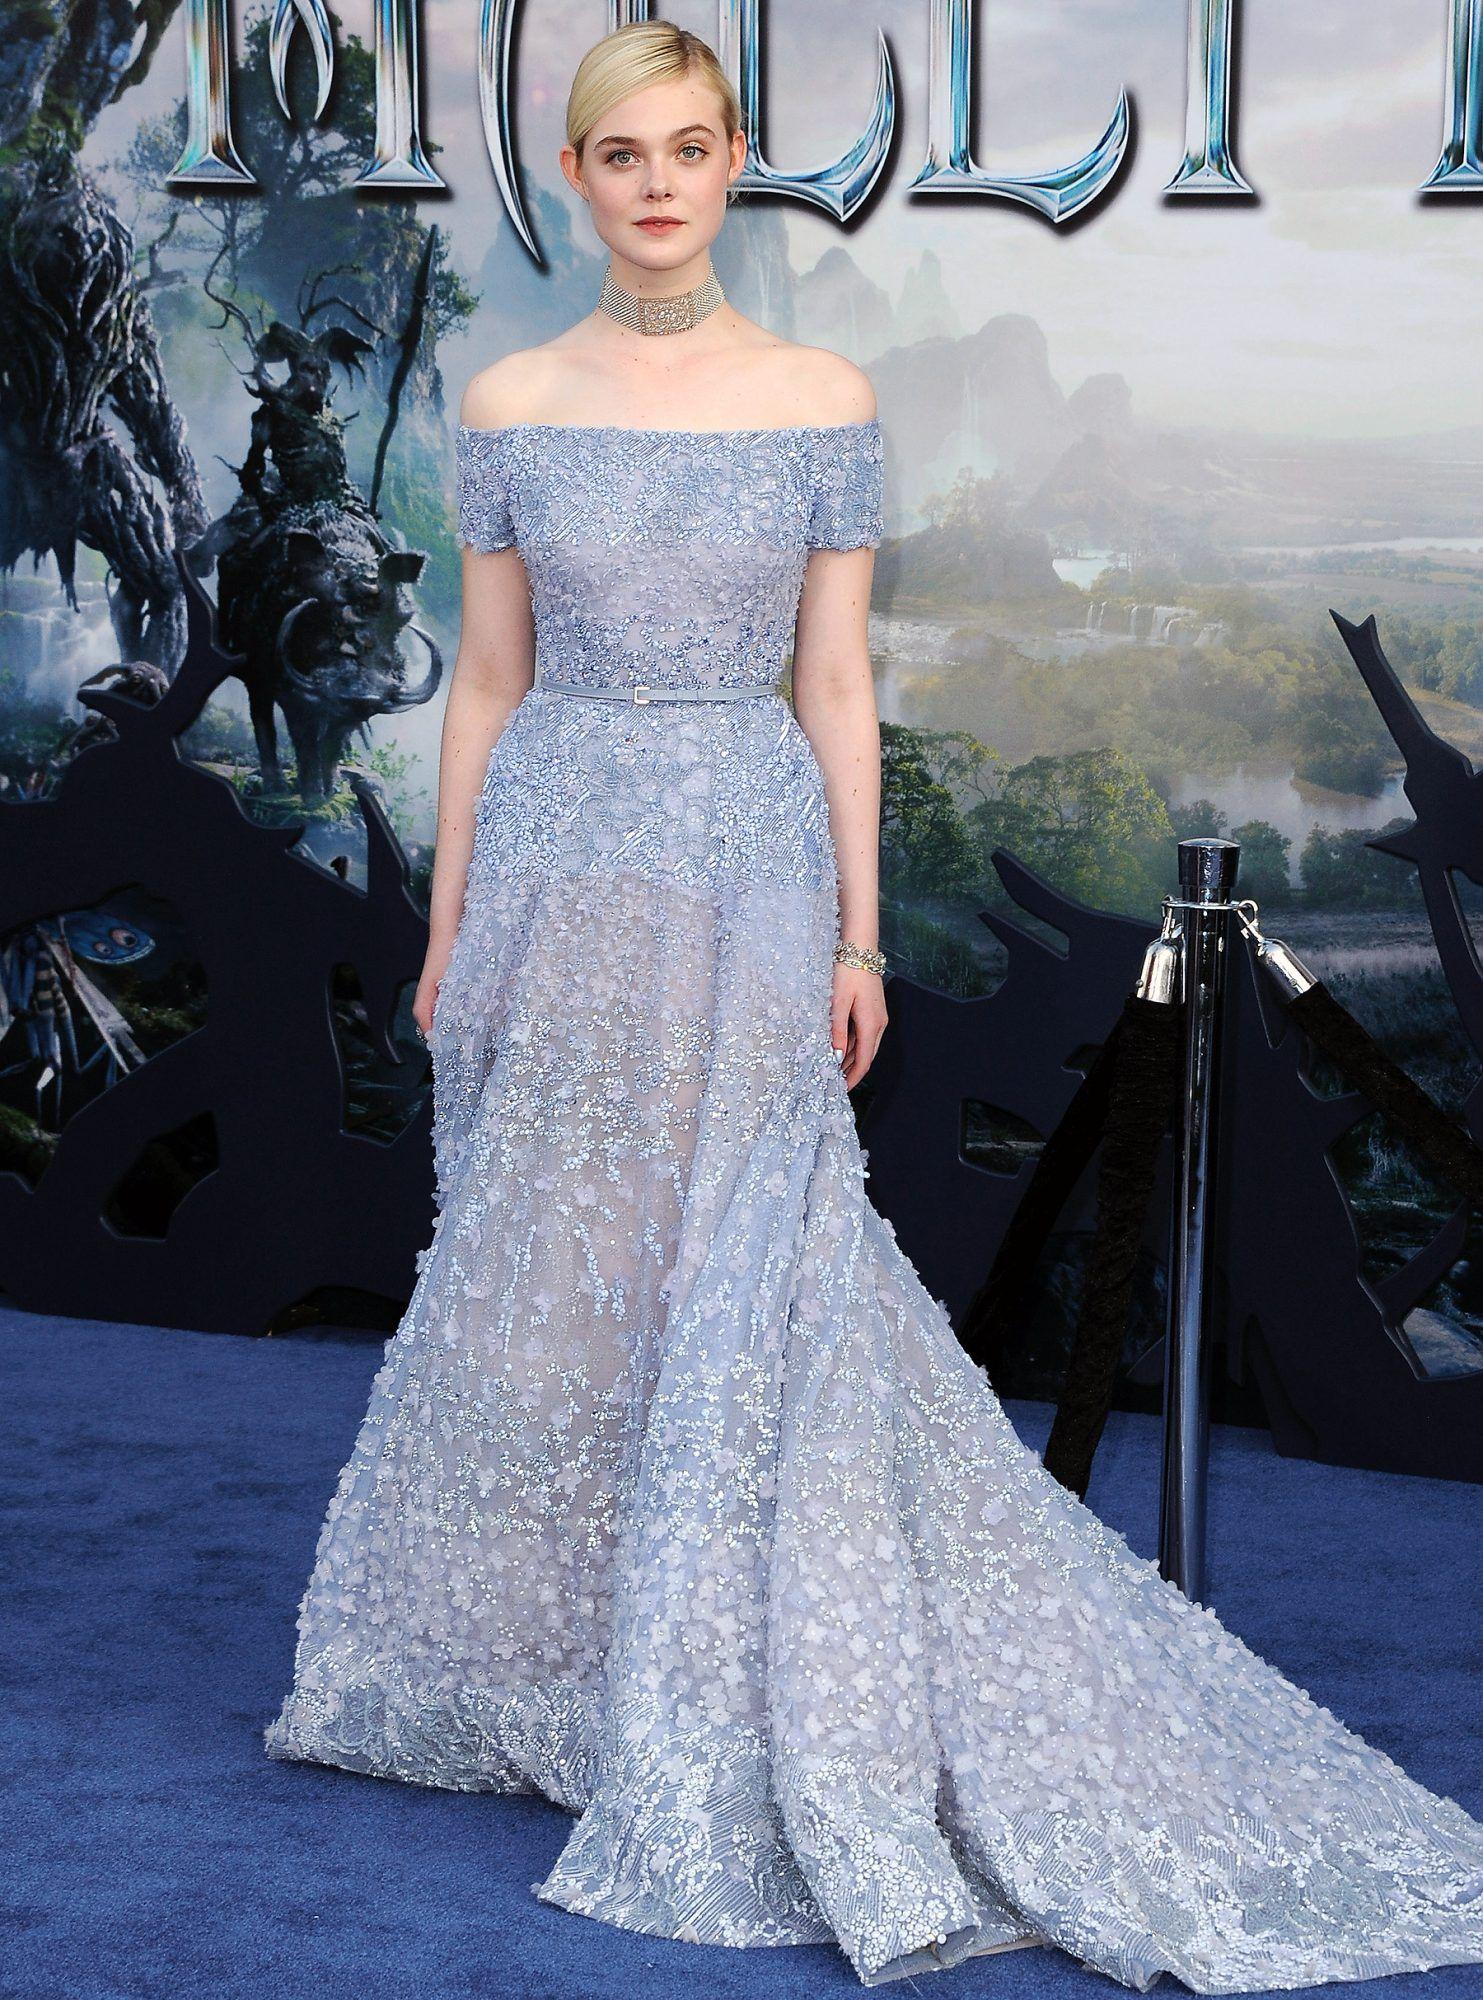 Bukan Dongeng! Ini Gaun Cinderella di Kehidupan Nyata!